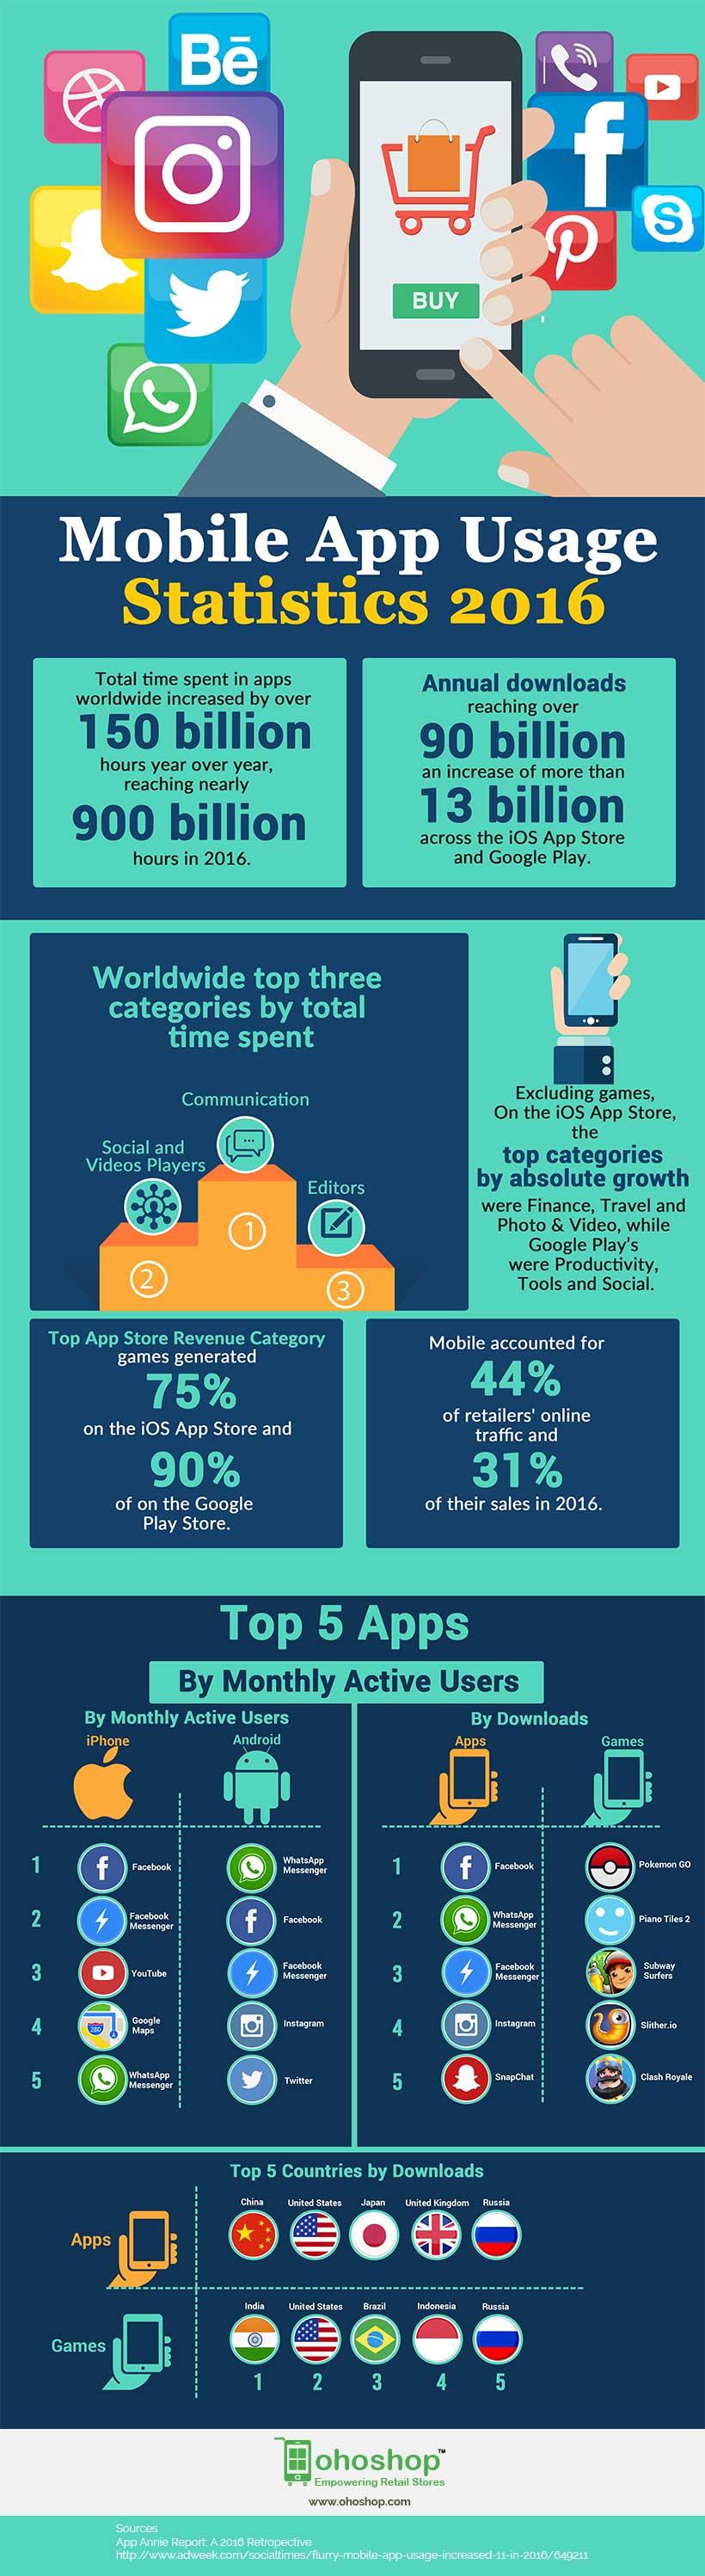 mobile-app-usage-2016